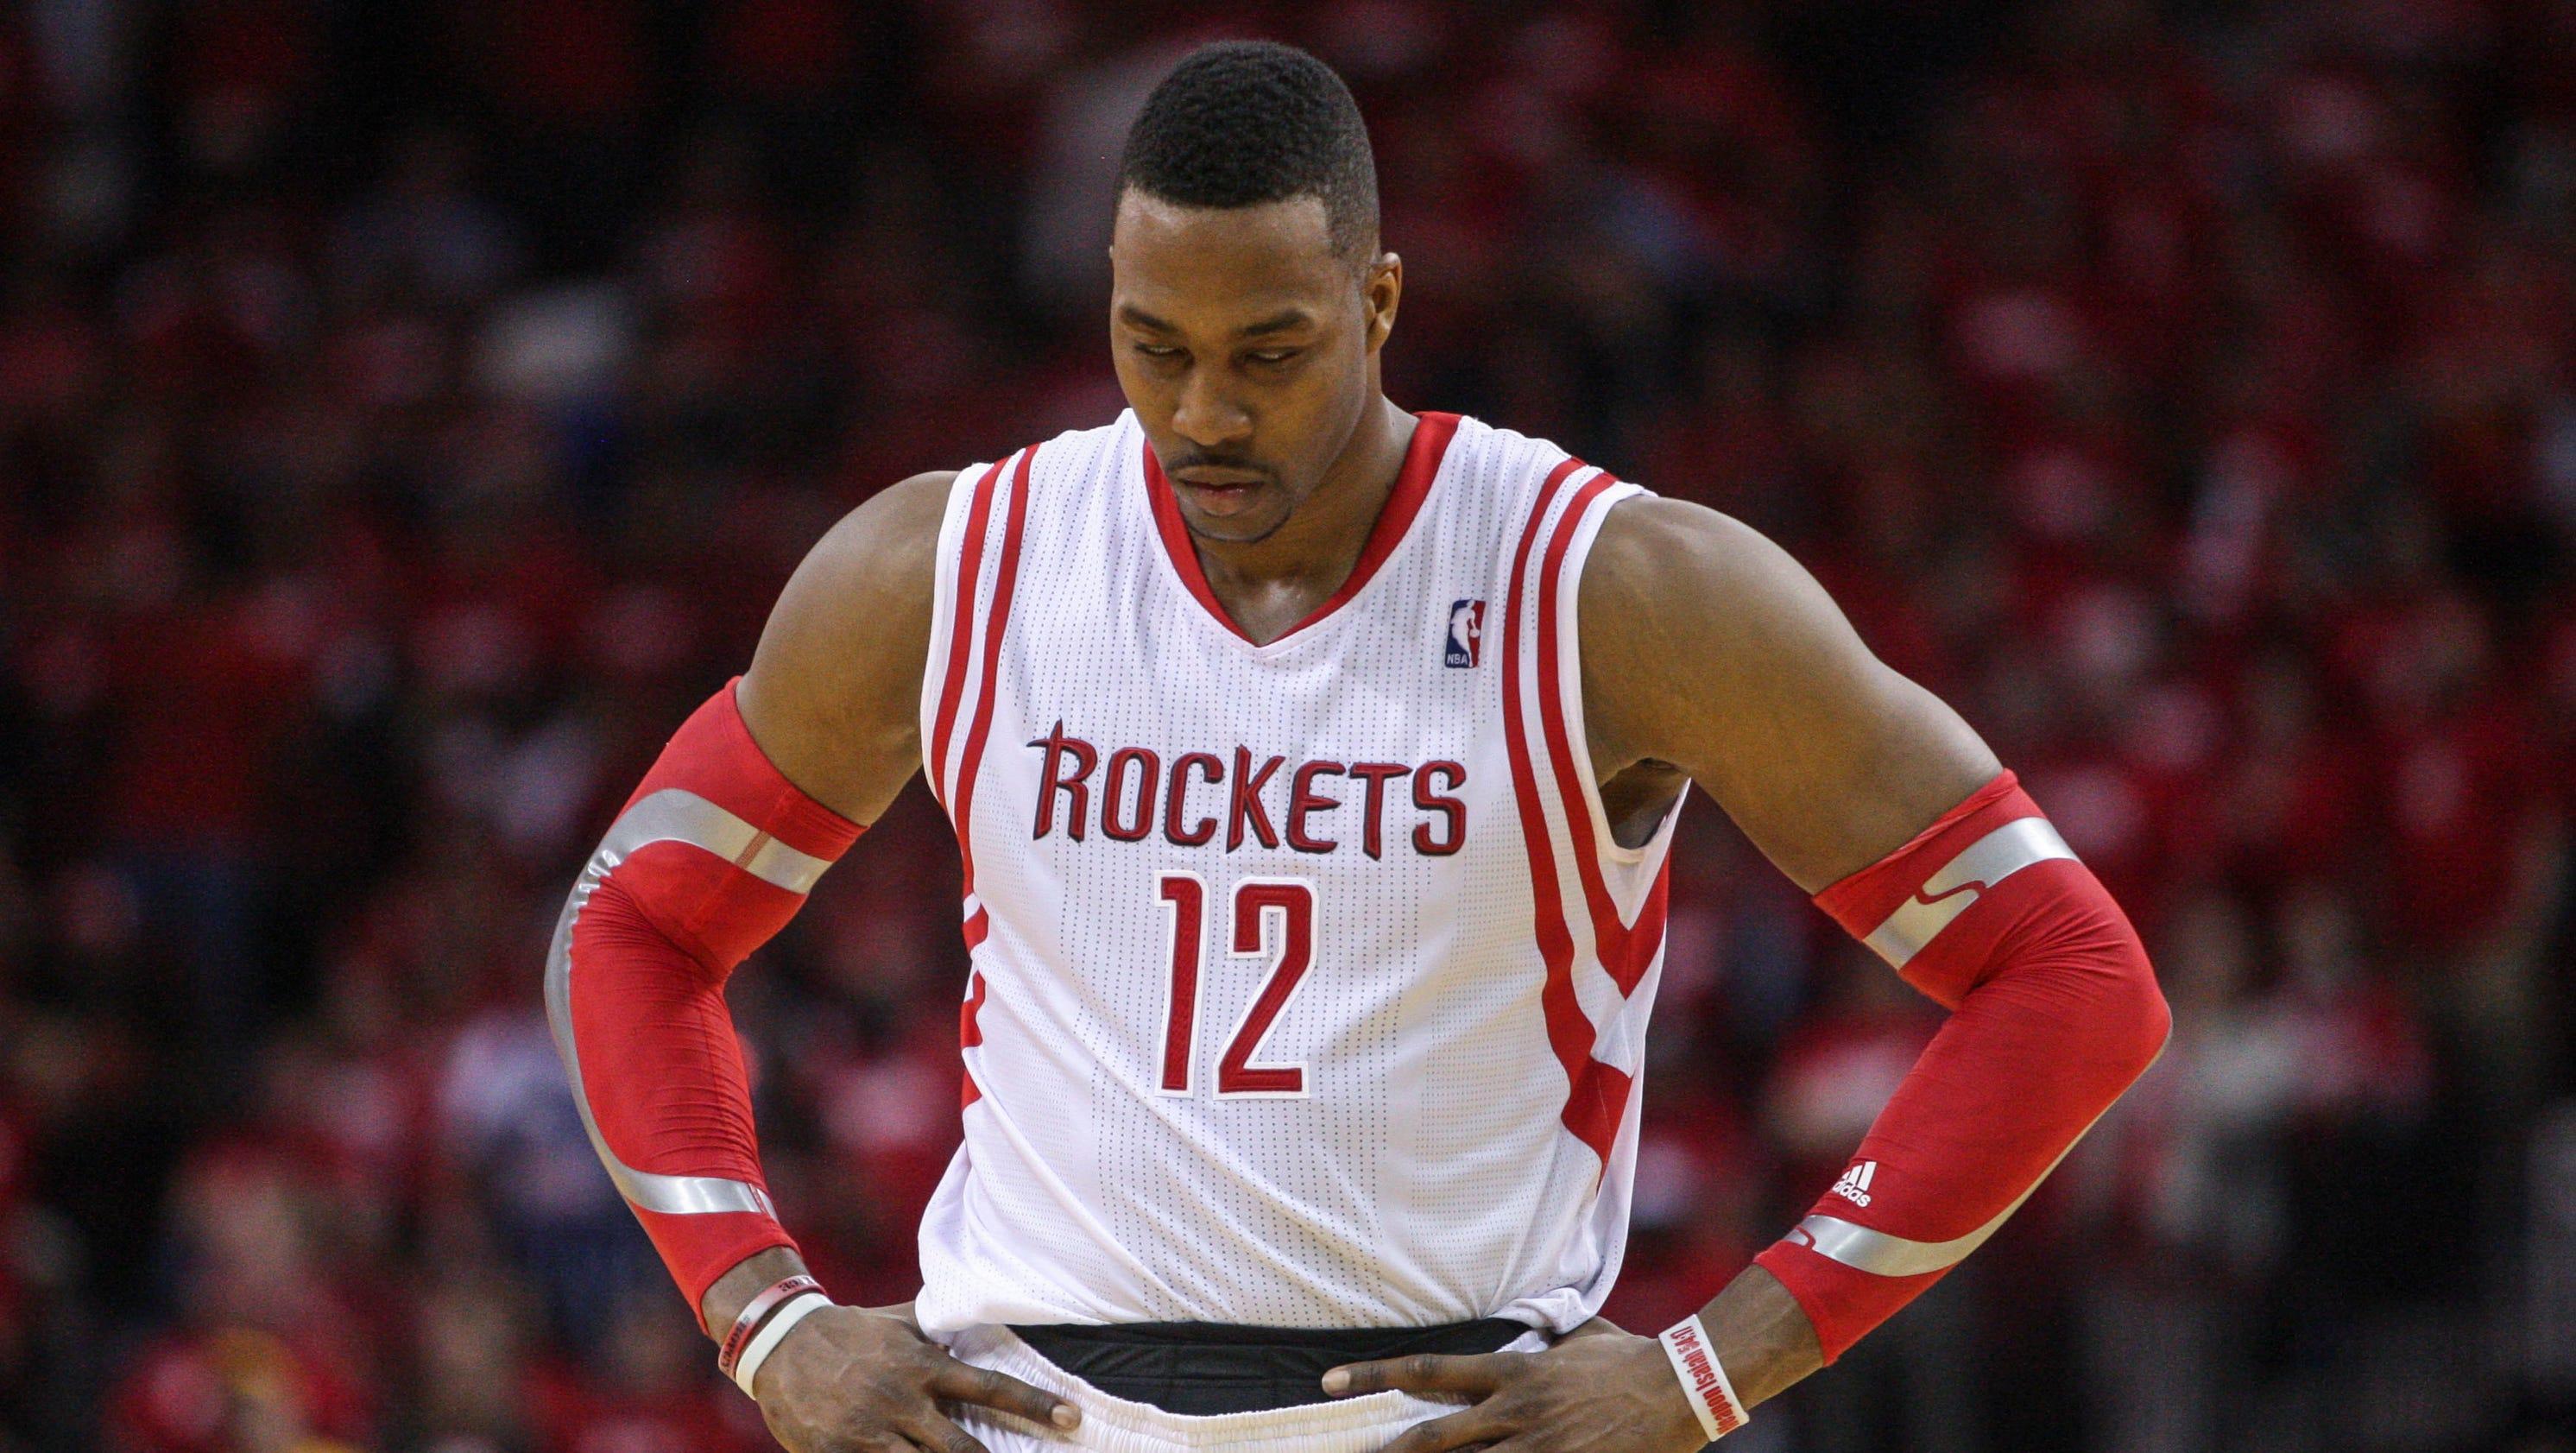 Nba Playoffs 2014 Rockets Vs Blazers   All Basketball ...